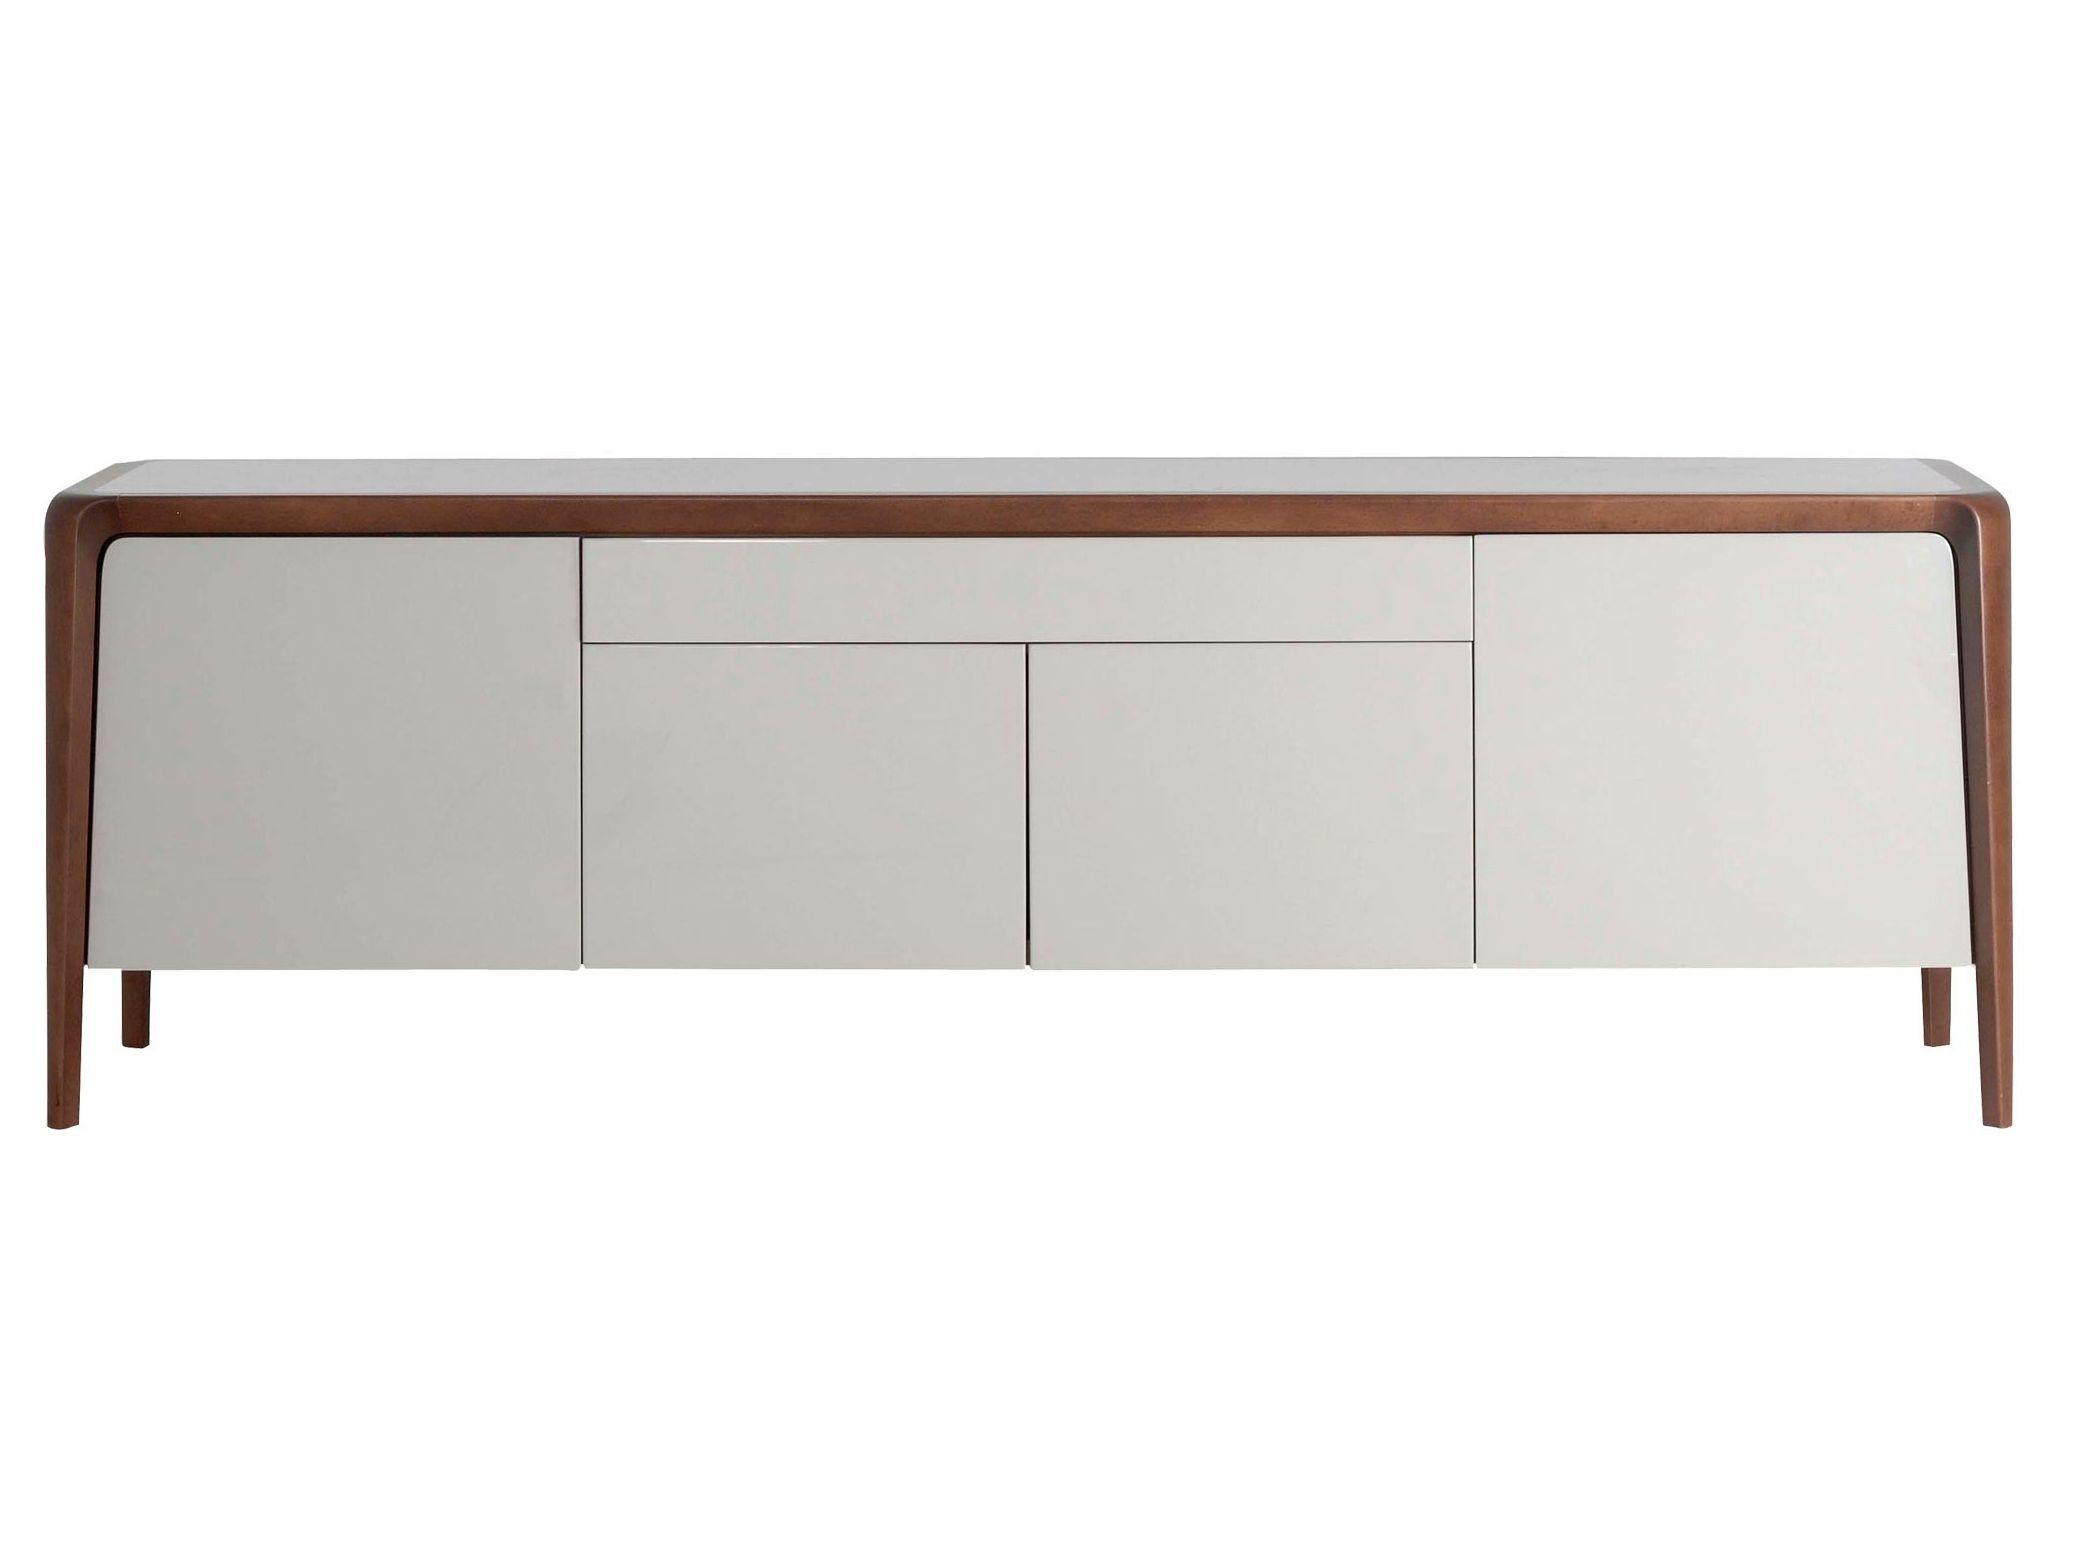 beech sideboard brio les contemporains collection by roche bobois design sacha lakic shelves. Black Bedroom Furniture Sets. Home Design Ideas